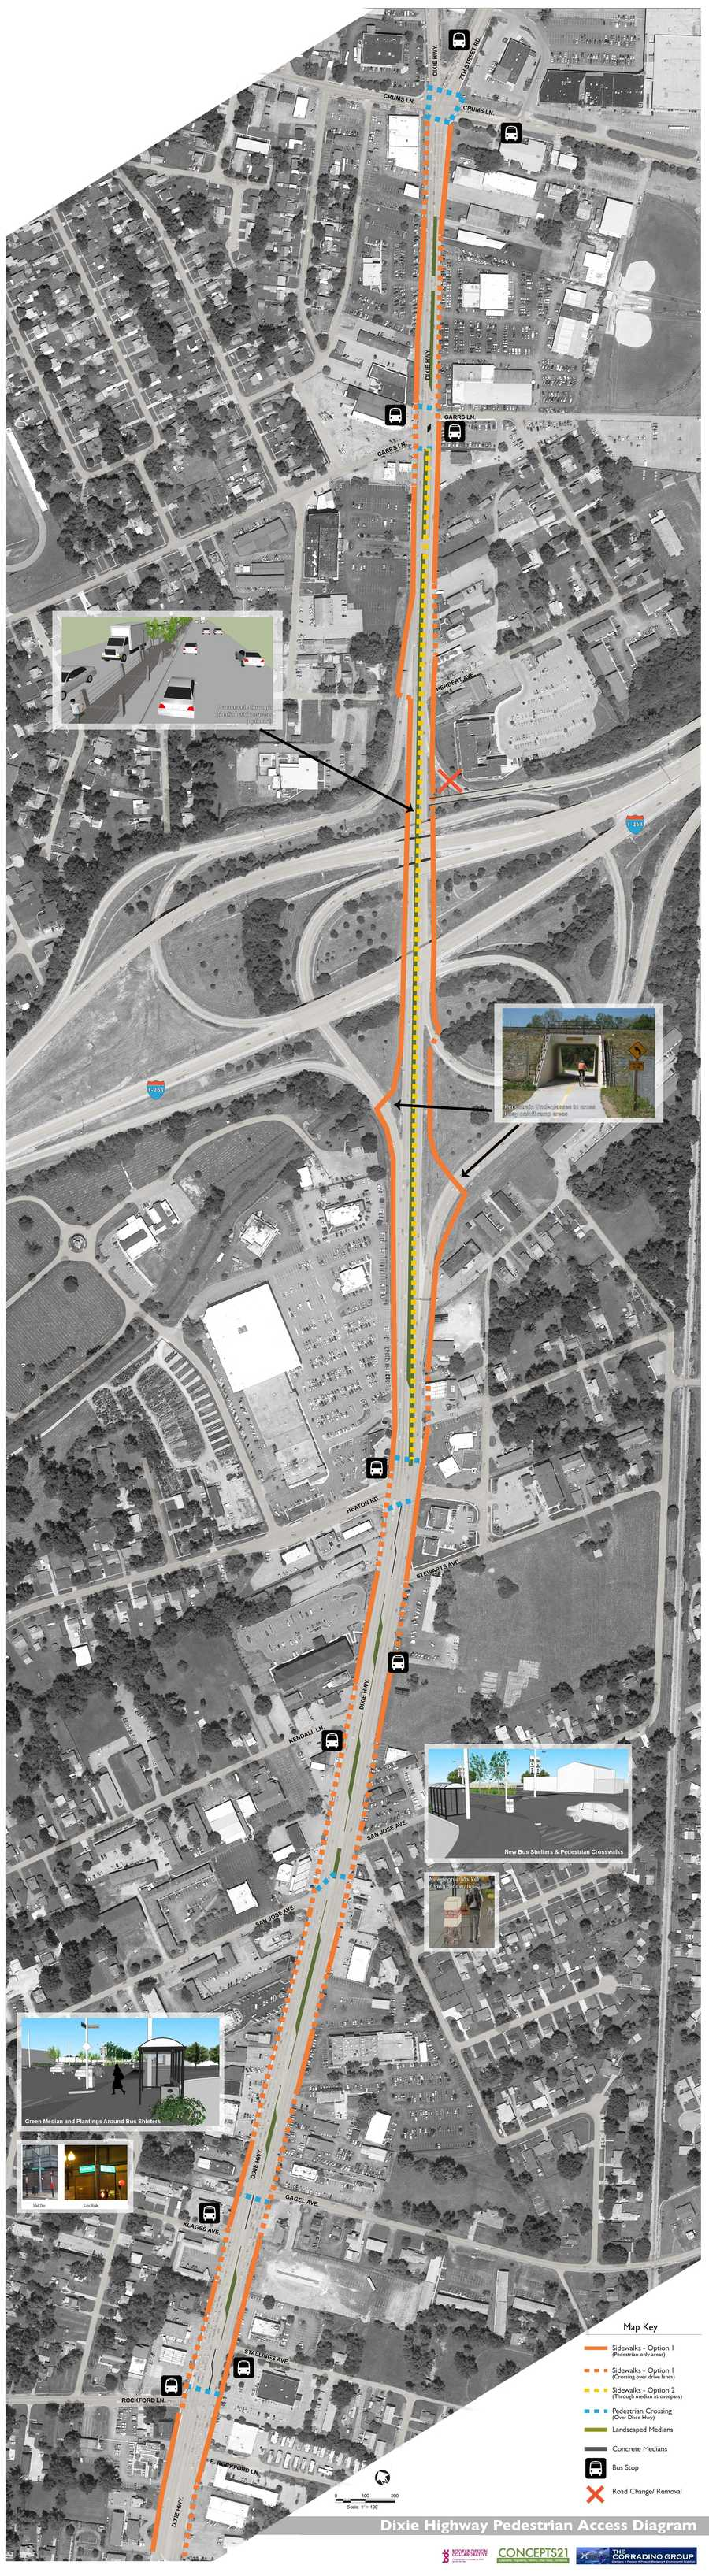 Dixie Highway Pedestrian Access Diagram